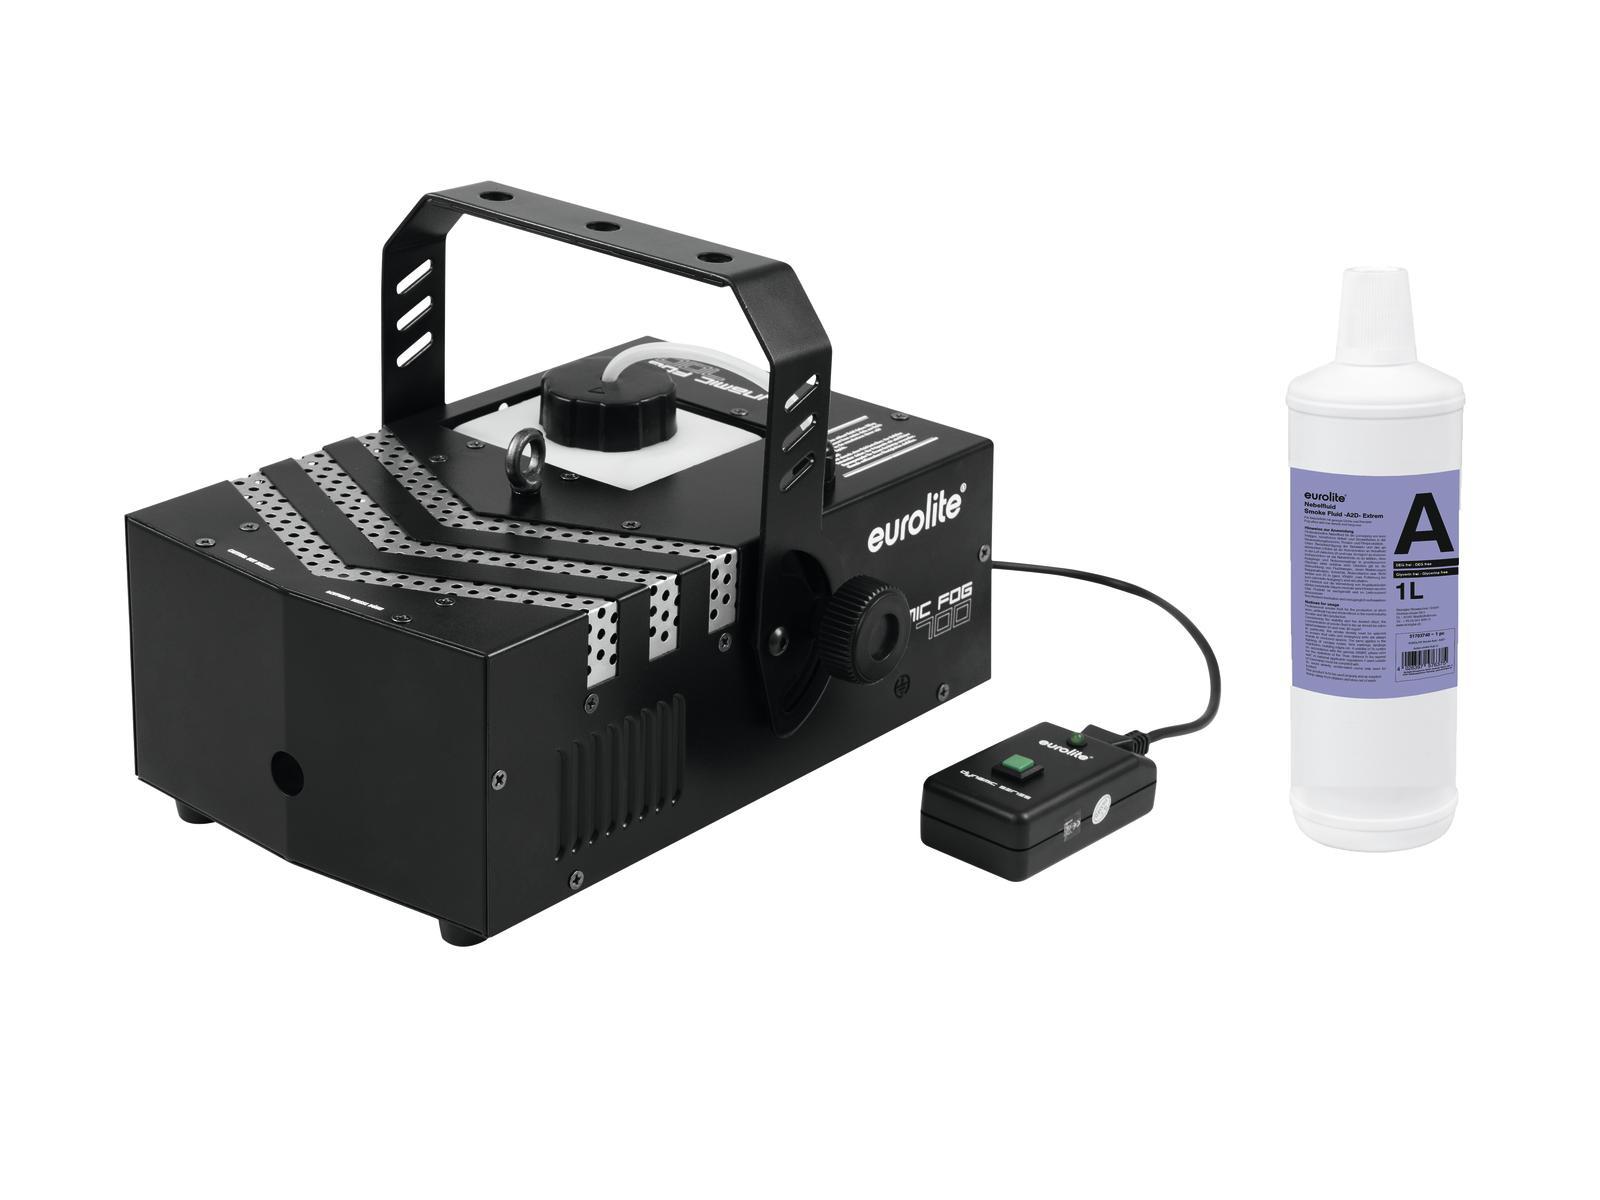 EUROLITE Set Dynamic Fog 700 + Smoke fluid -A2D- 1l